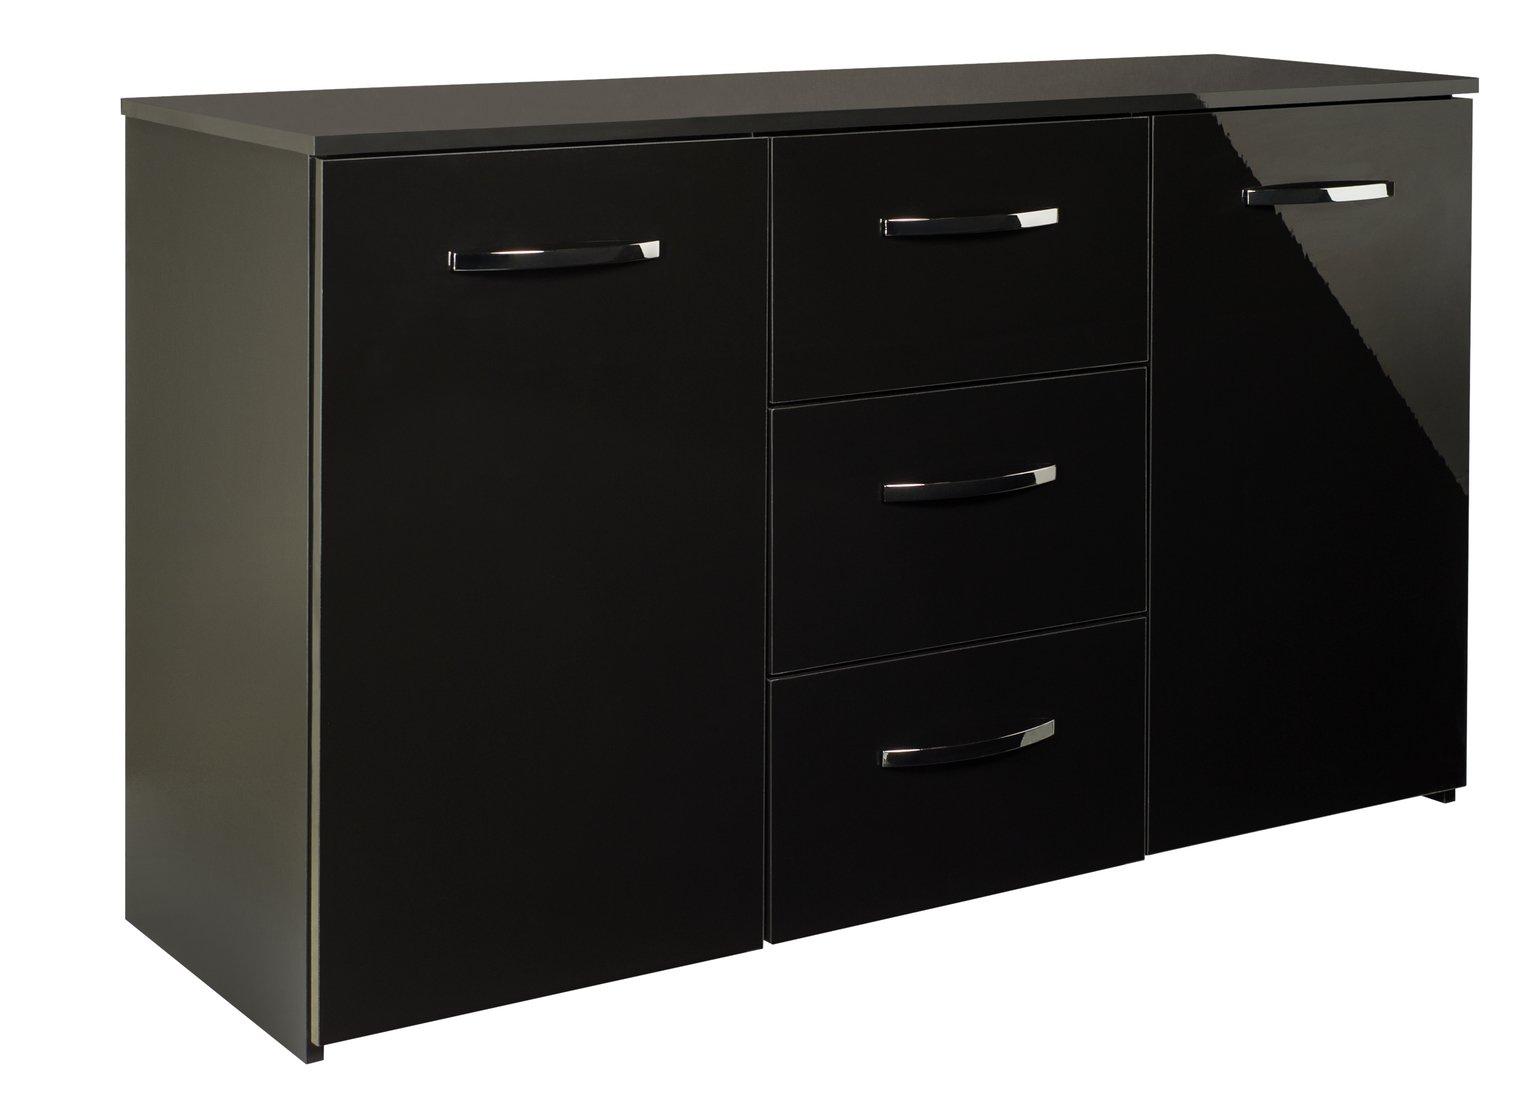 Argos Home Hayward 2 Door 3 Drawer Sideboard - Black Gloss